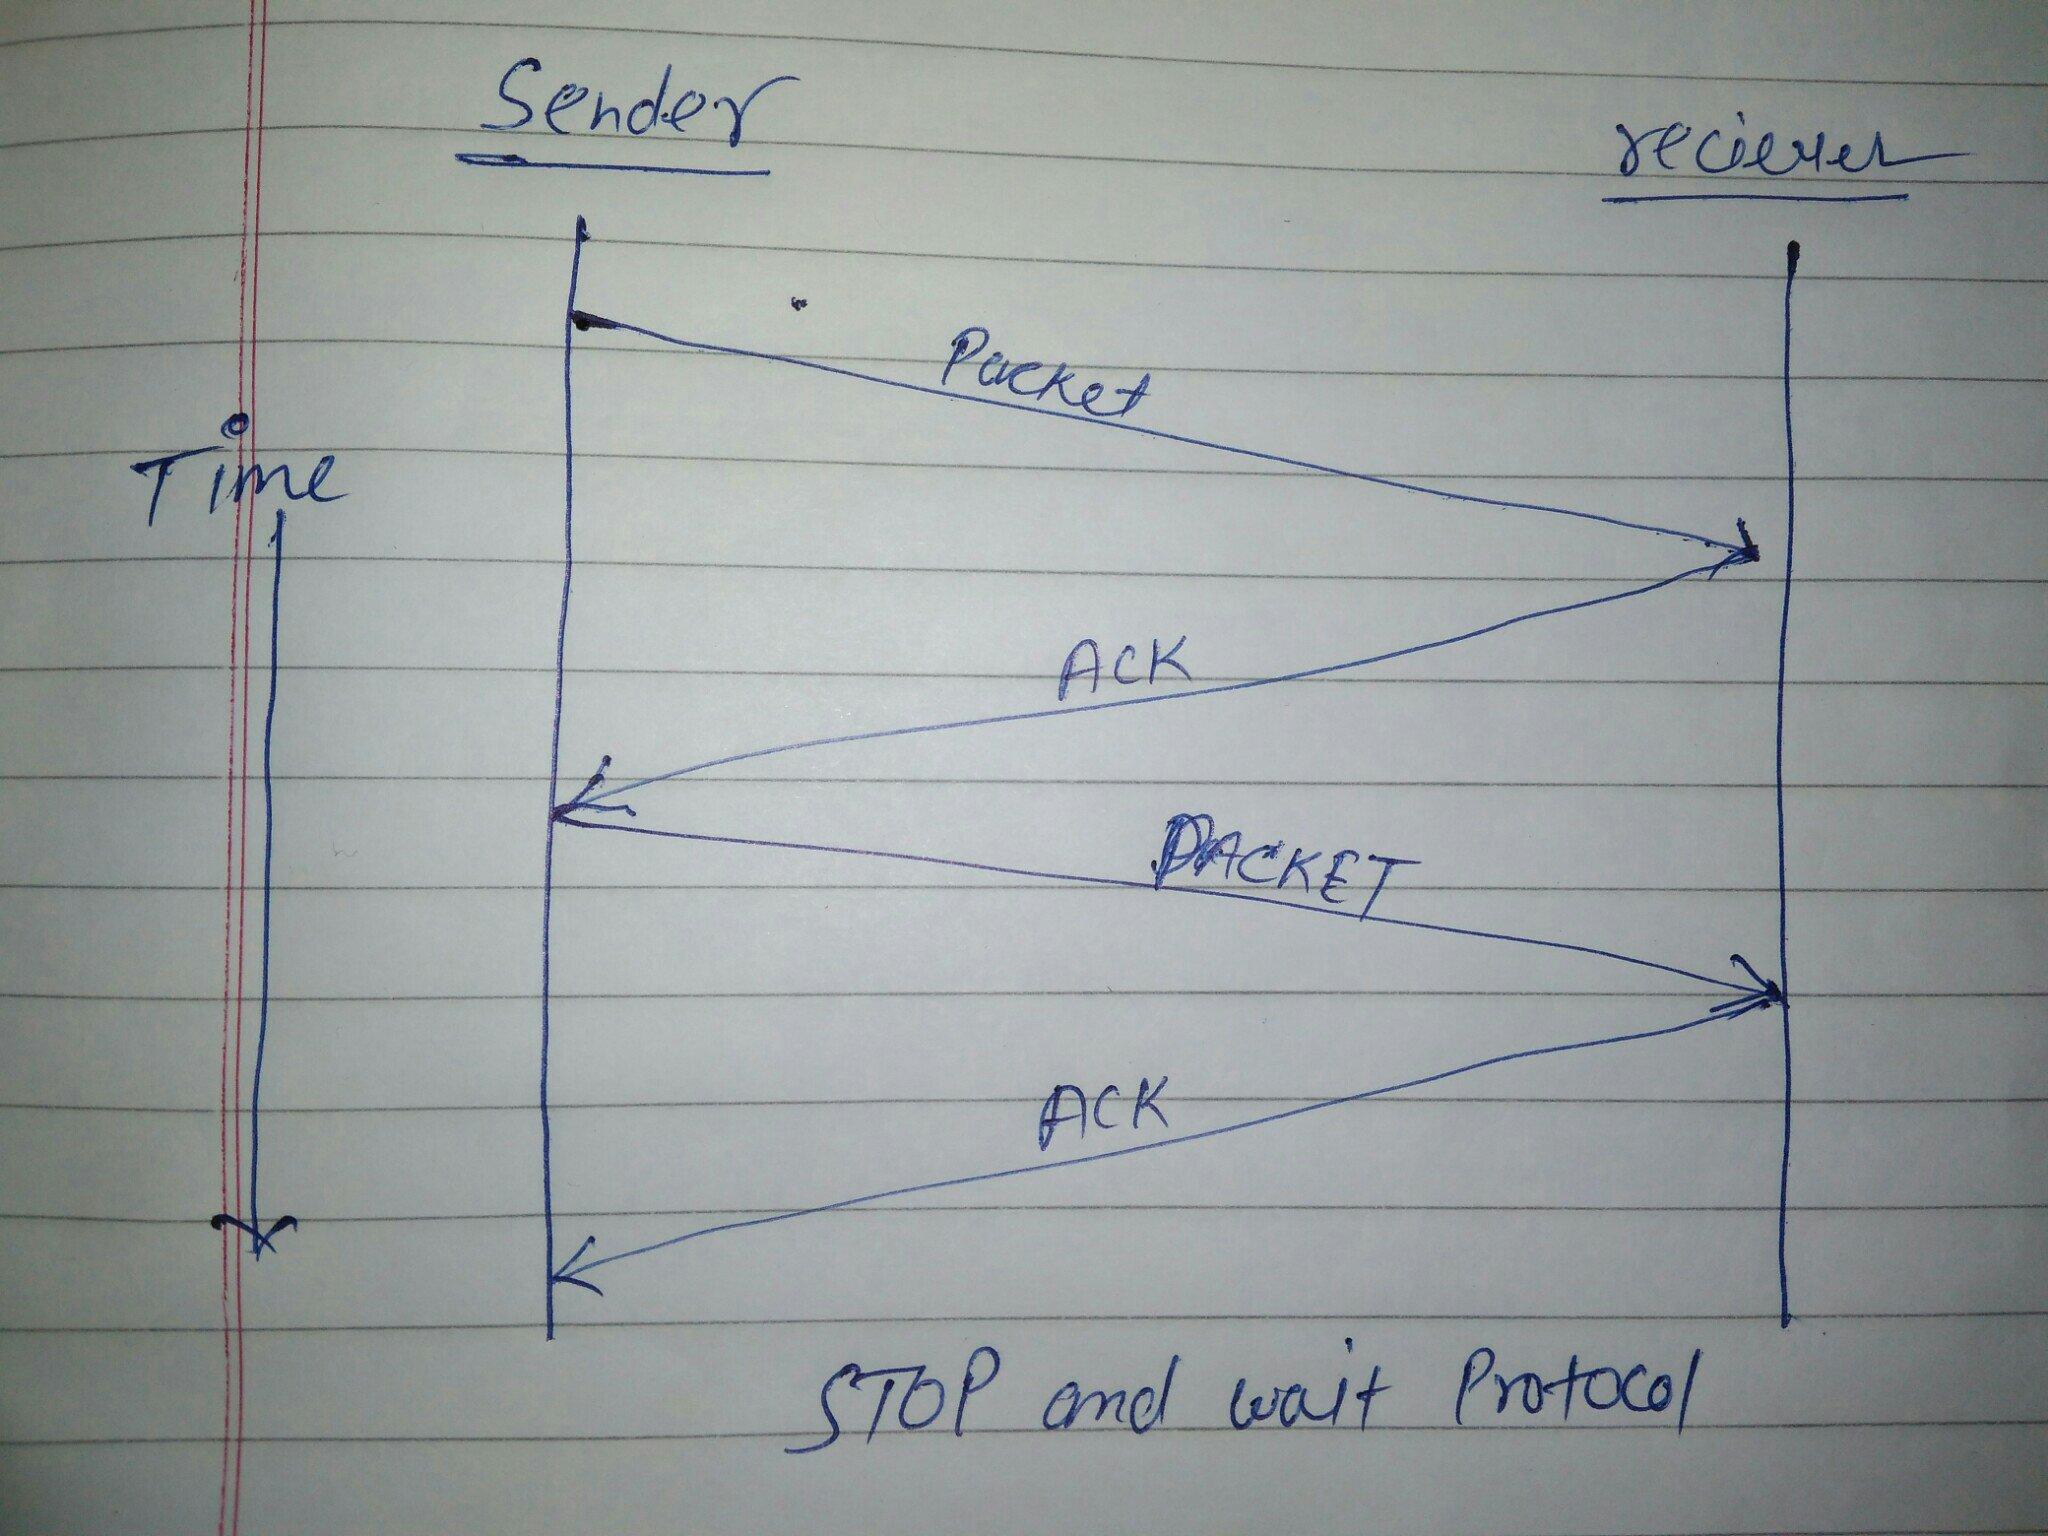 Stop & wait protocol